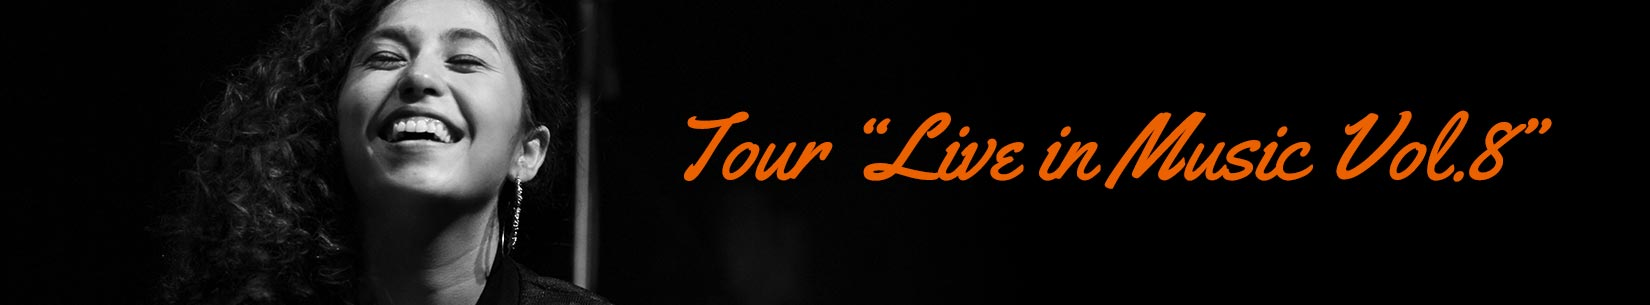 MIHO FUKUHARA TOUR 「Live in Music」 Vol.8